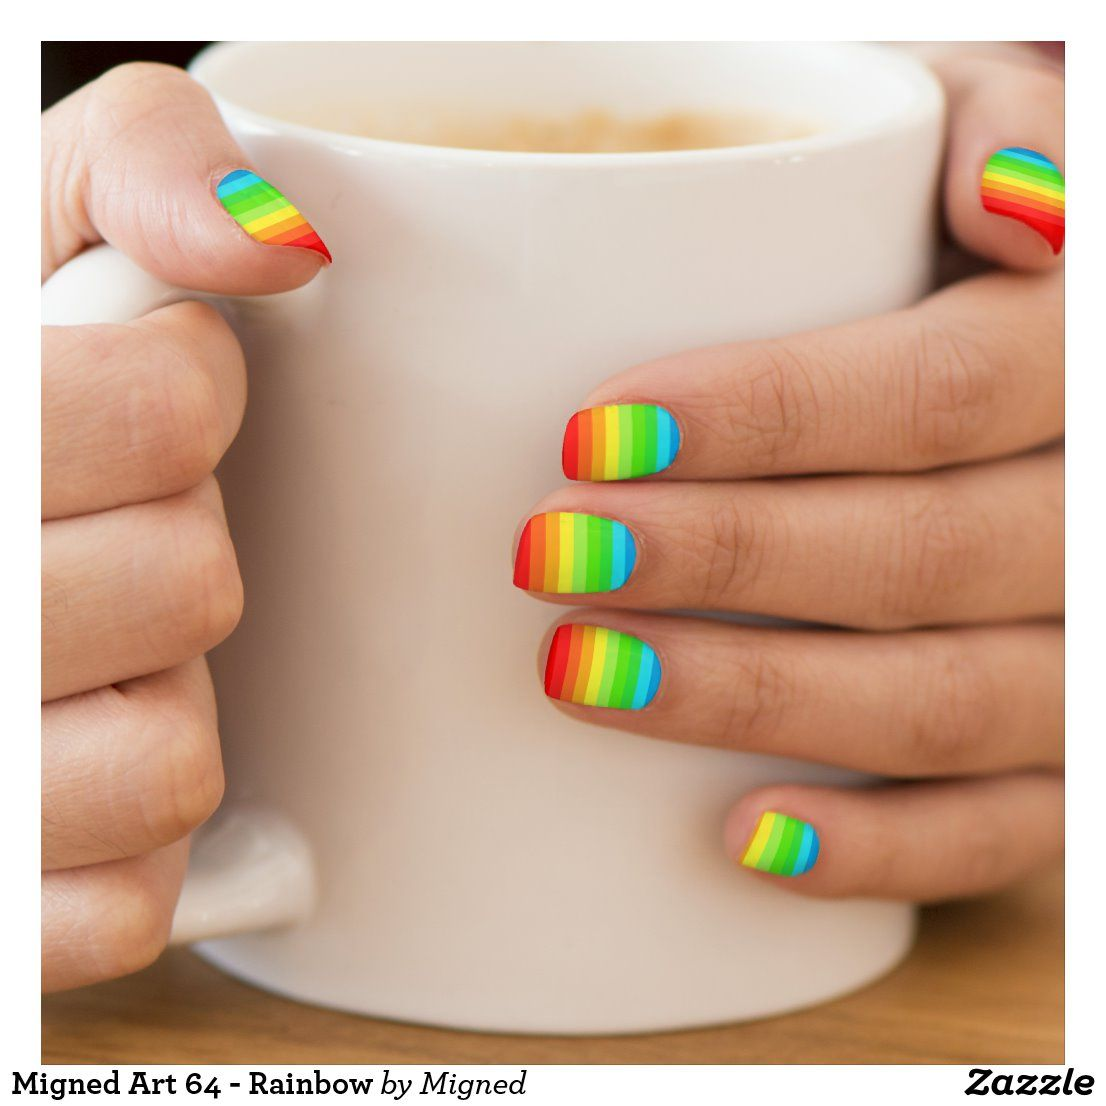 Migned Art 64 - Rainbow Minx Nail Art | Zazzle.com